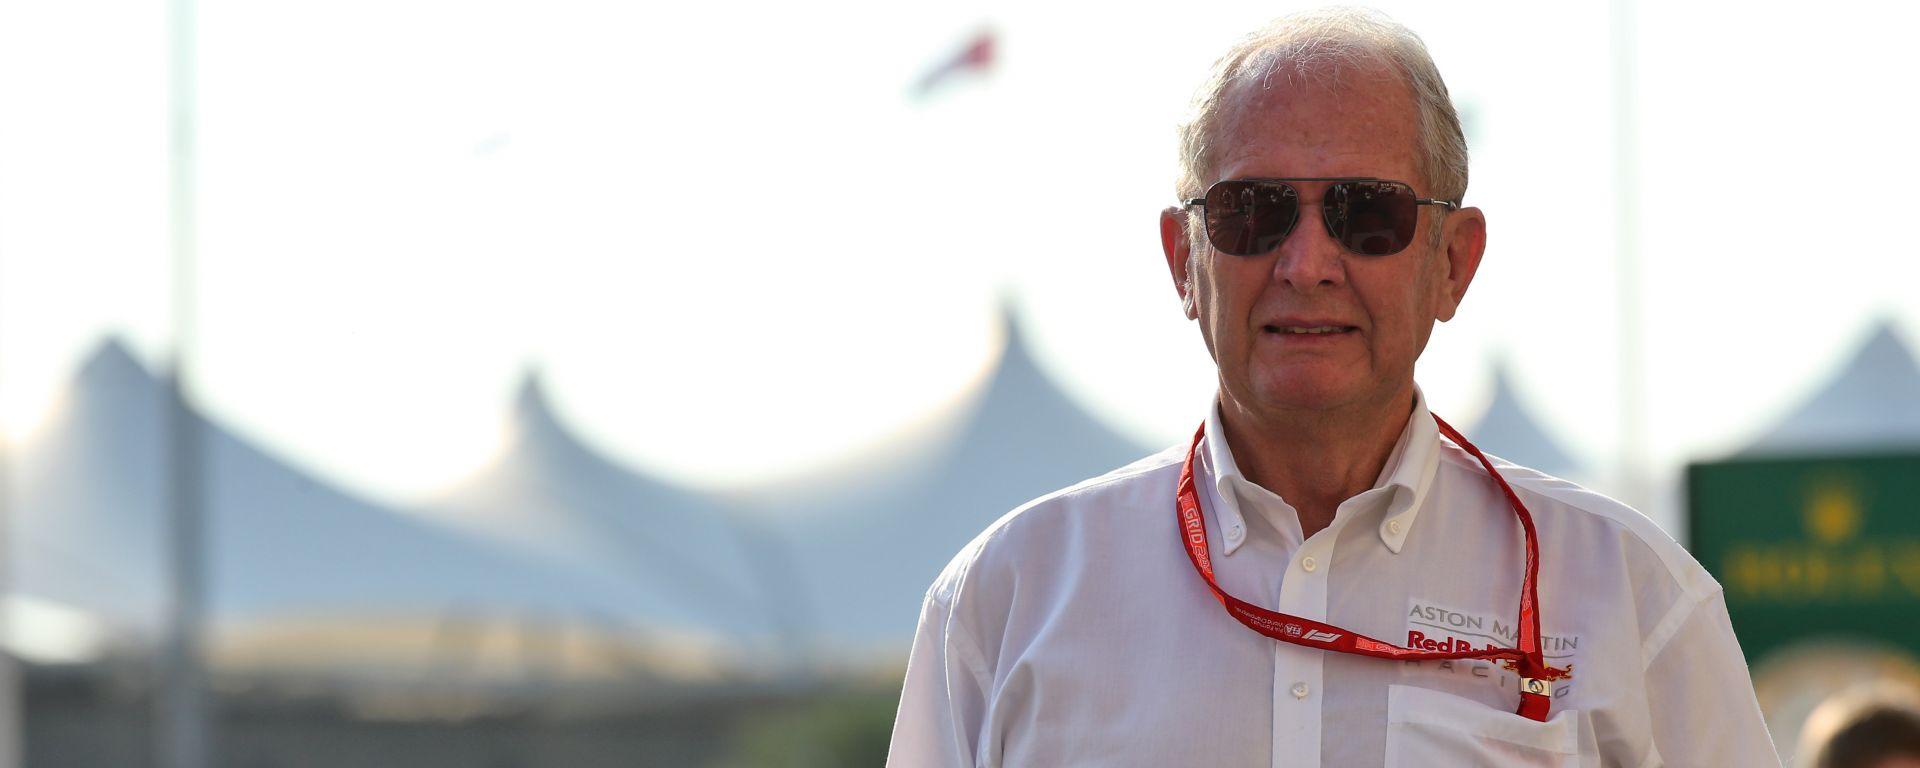 F1 GP Abu Dhabi 2019, Yas Marina: Helmut Marko (Red Bull Racing)